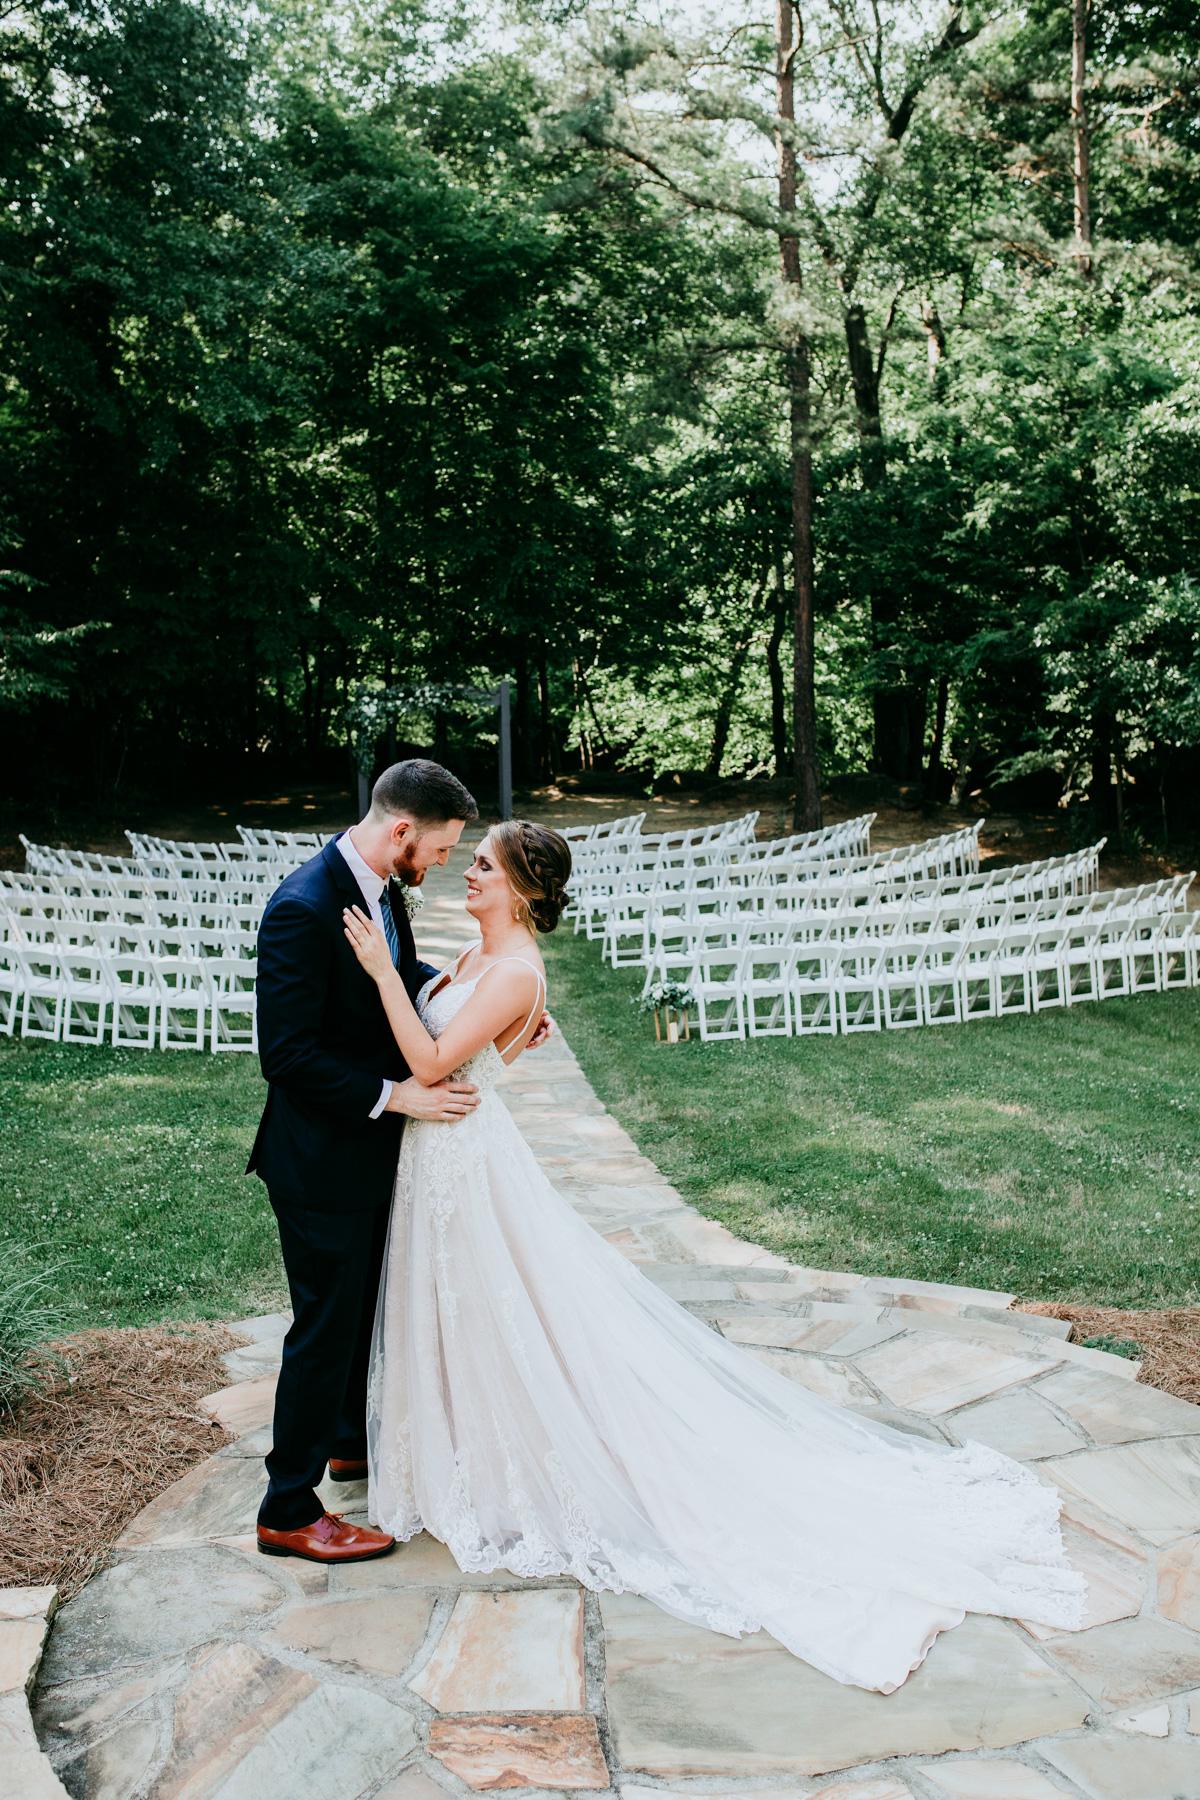 romantic-outdoor-wedding-locations.jpg